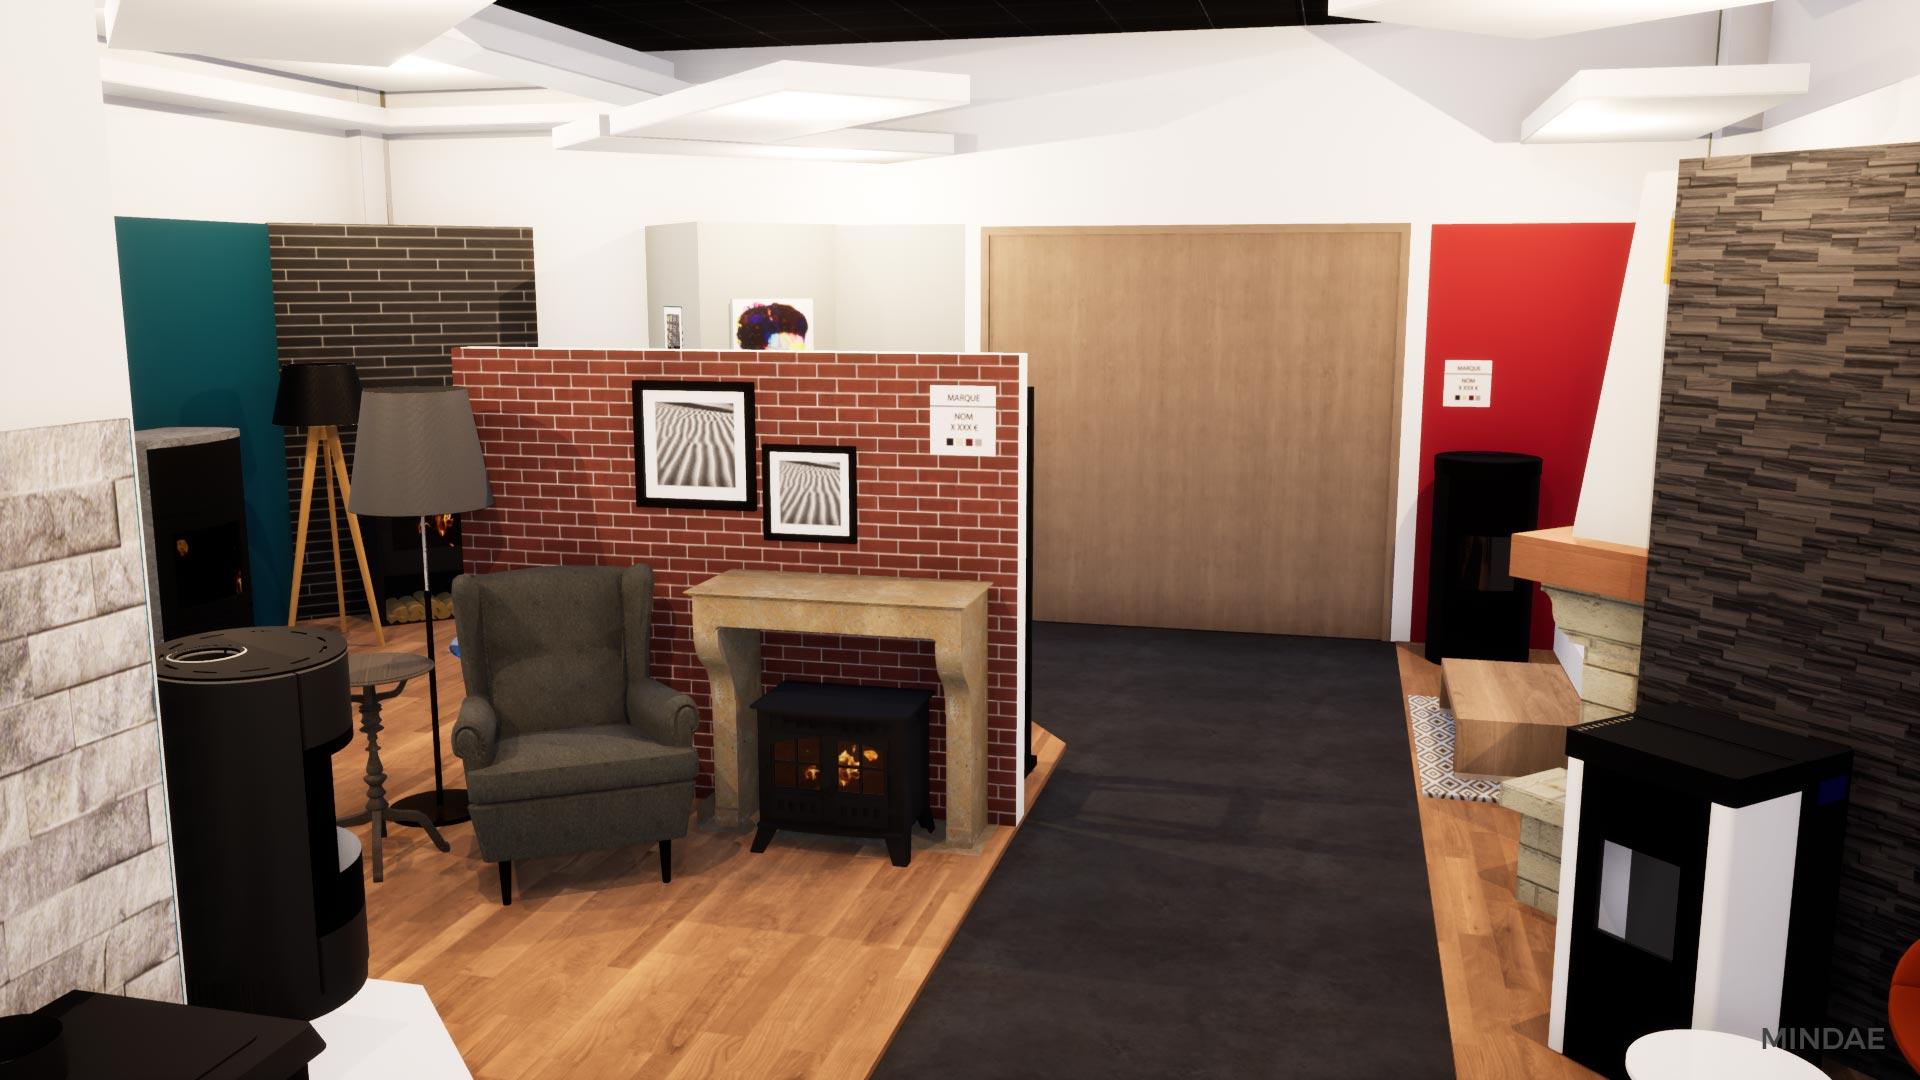 Mindae_3D_projet_agencement_poele_bois_cheminee_showroom_flamdesign_magasin_mondeville-(12)